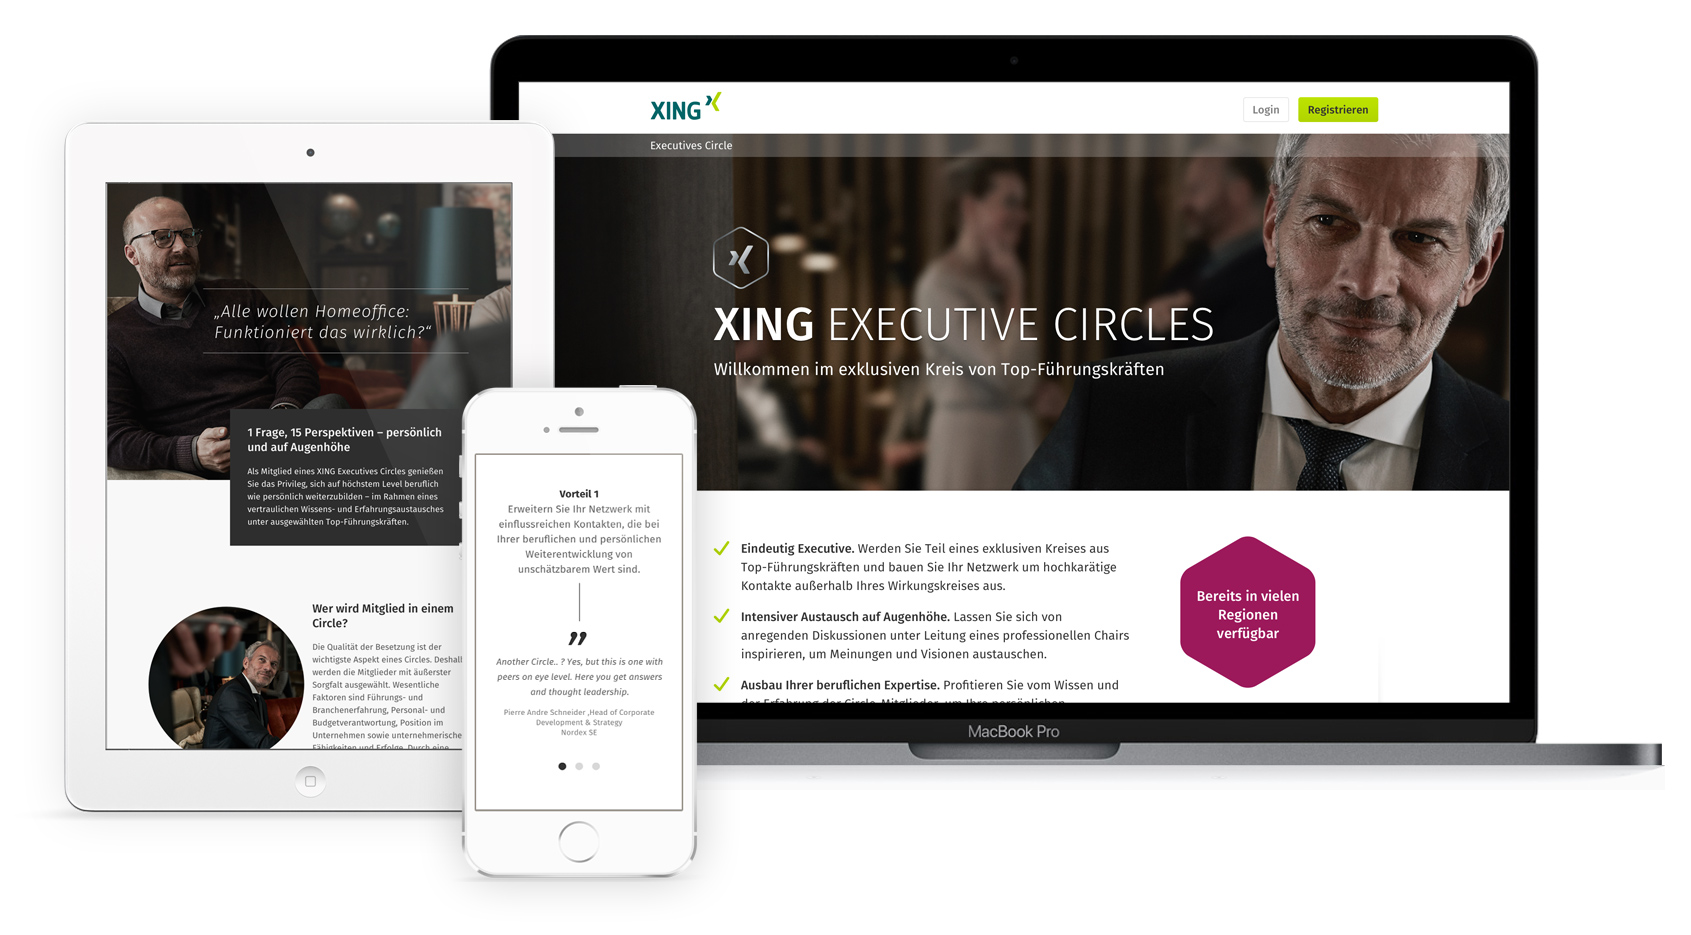 XING-Executive-Circle.jpg